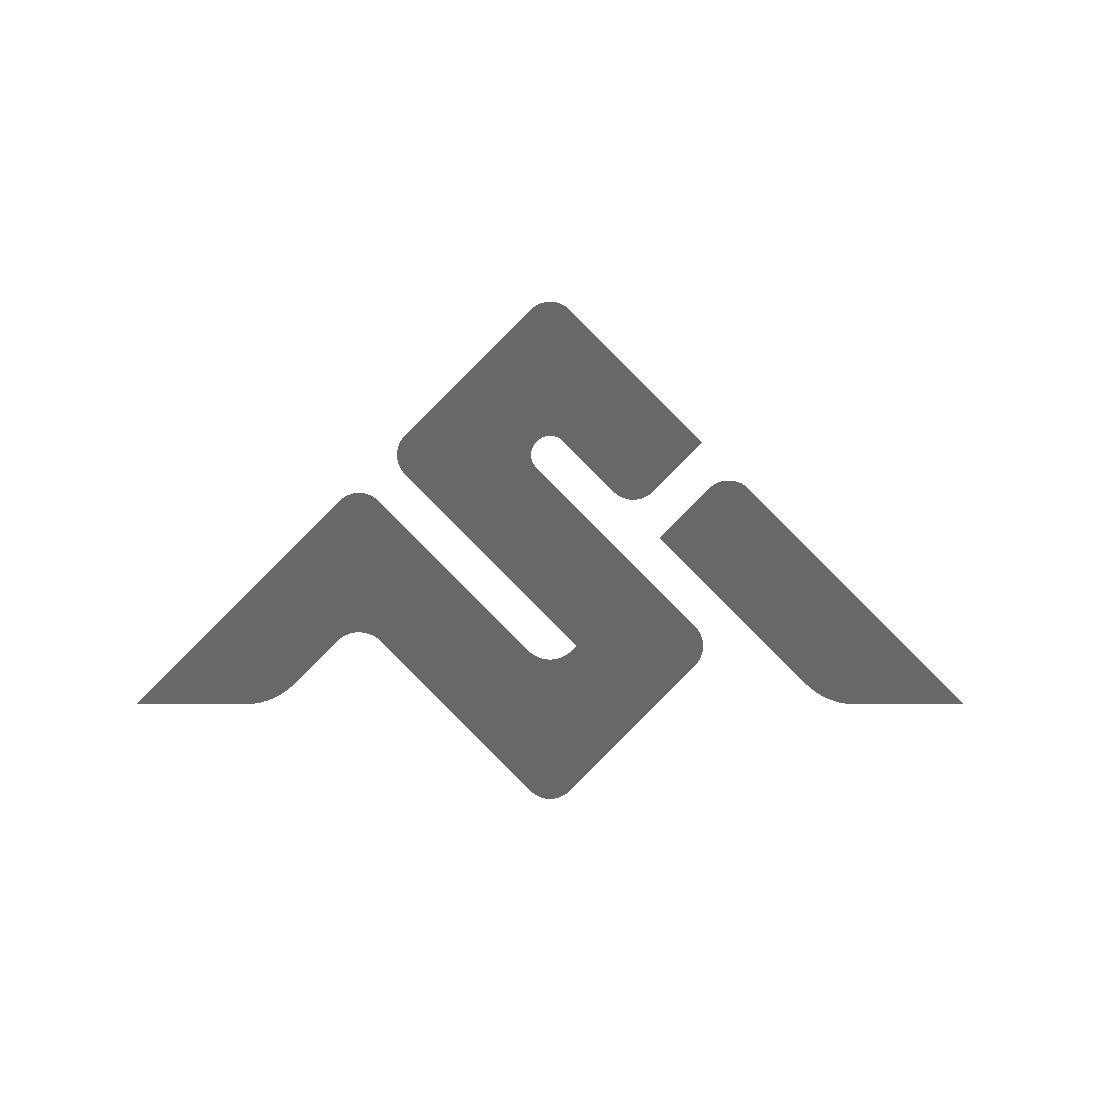 Shoe Nordic Ski Alpina Racing RSK Cross Country Shoes Skating - Alpina nordic boots